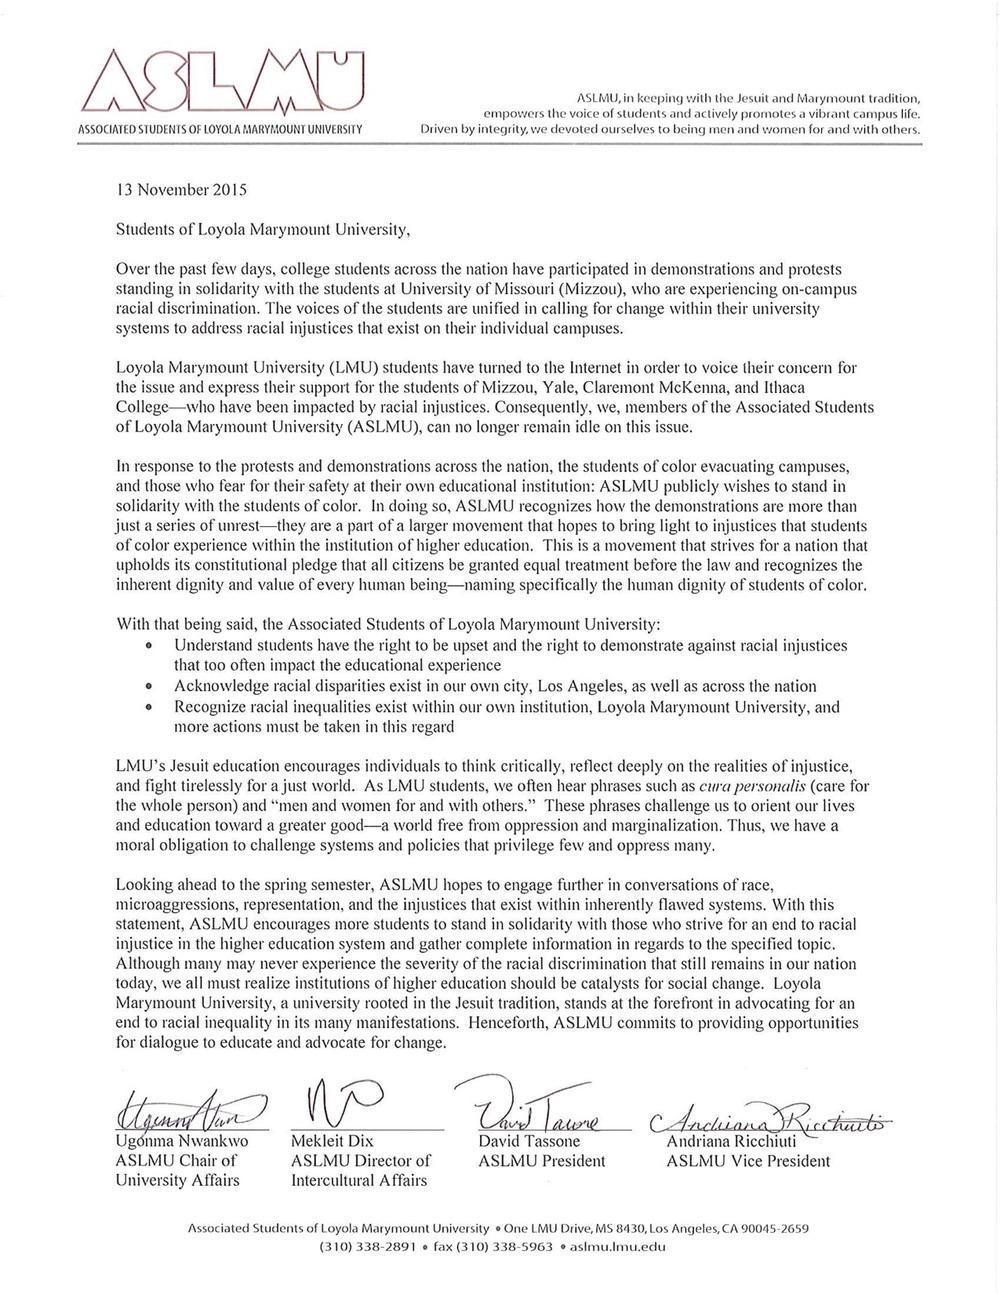 ASLMU Stands in Solidarity